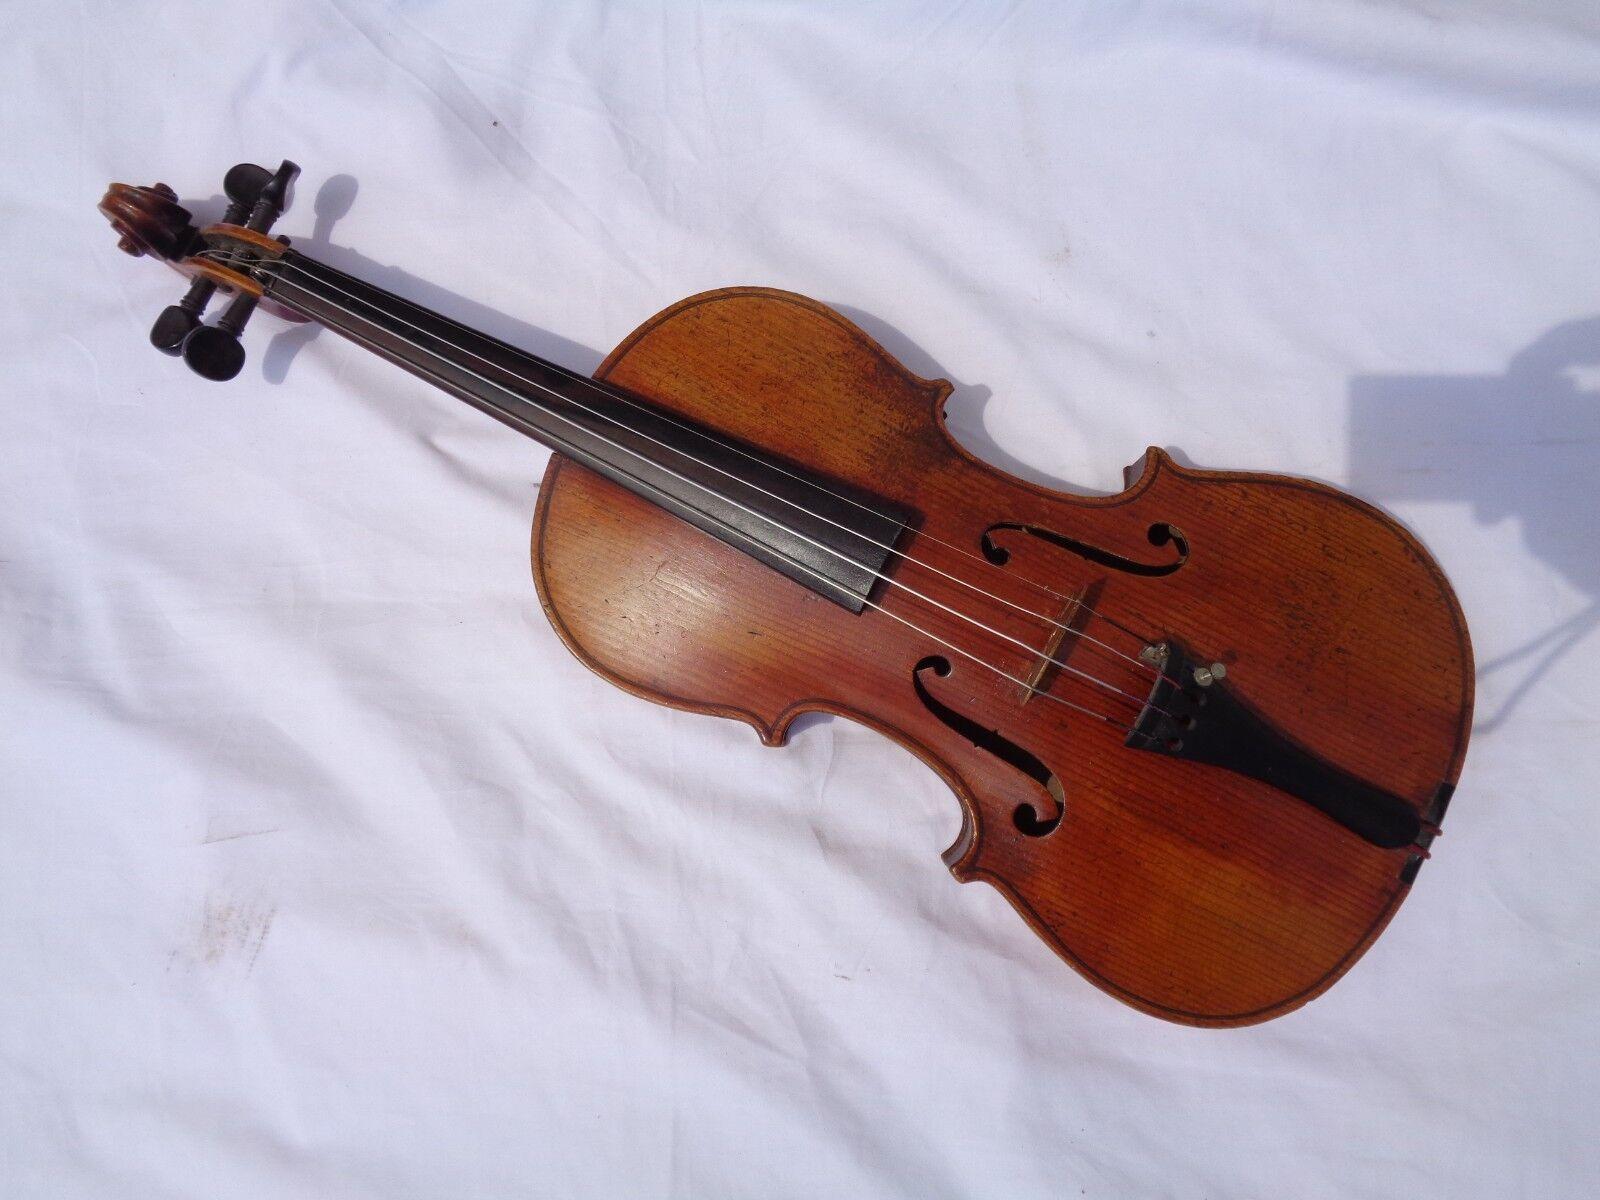 Alte Geige Violine Full Größe ca 59,5 cm Korpus 35,8 cm